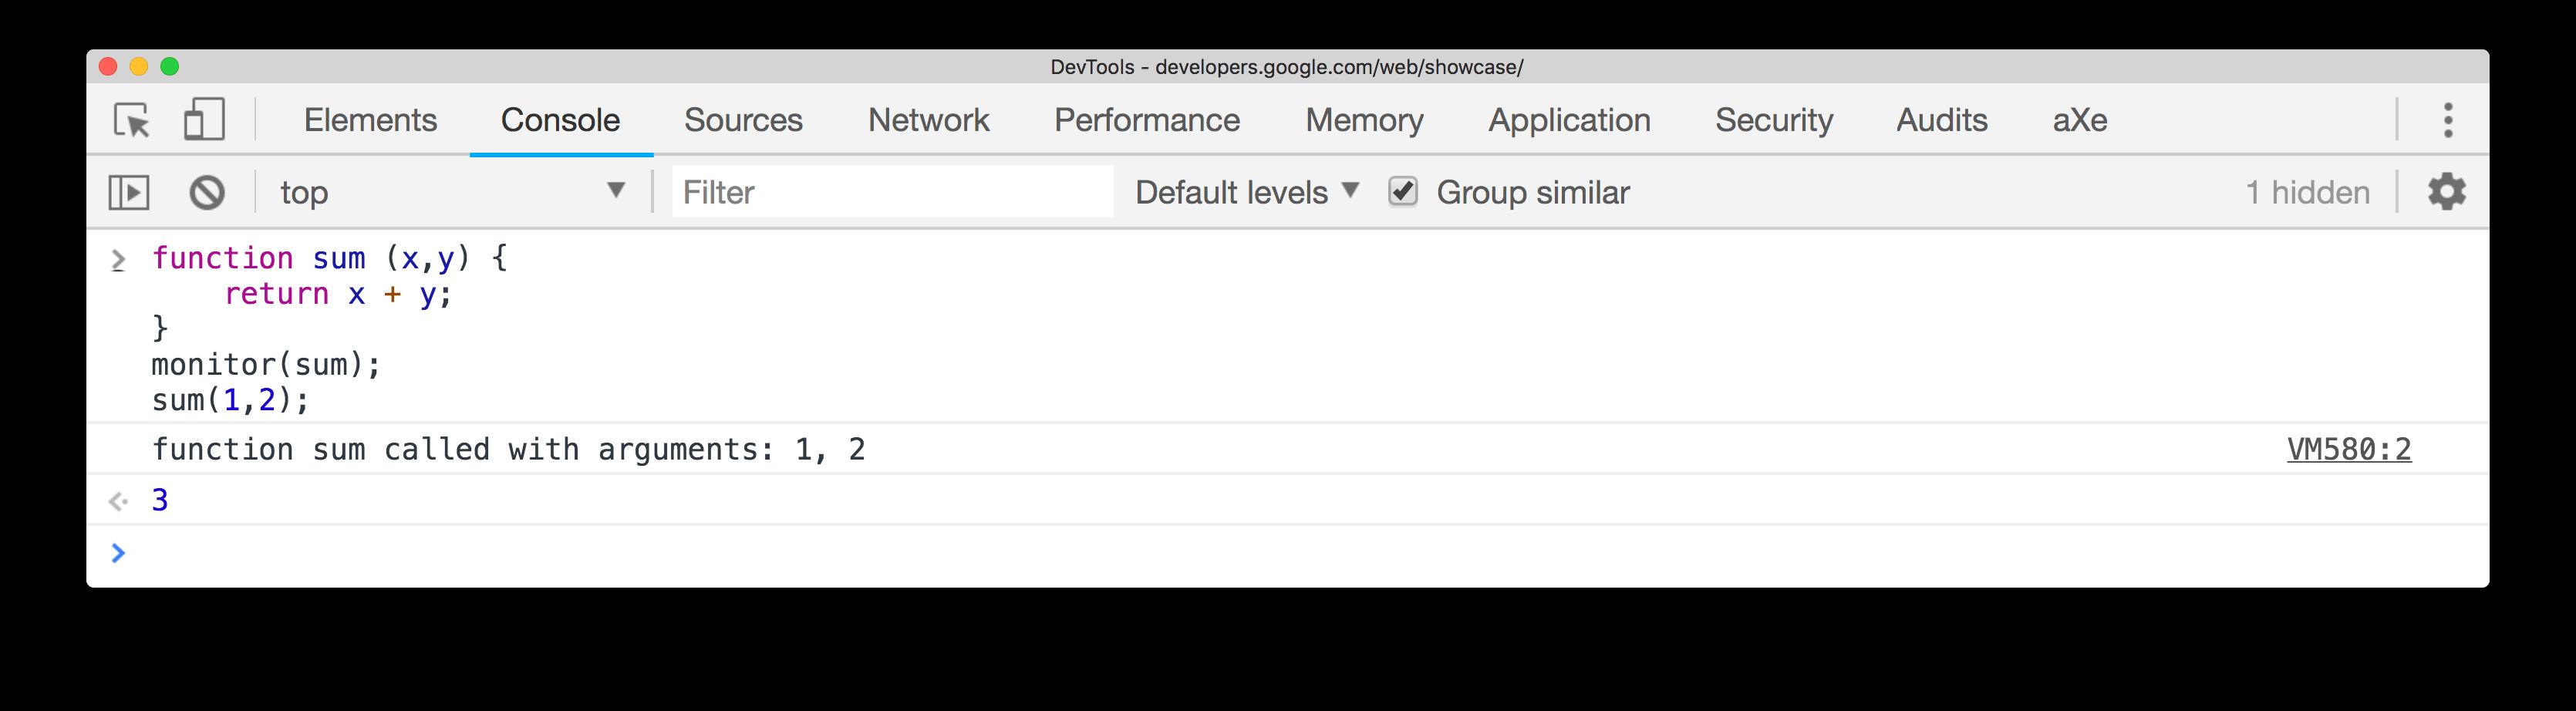 Example of monitor() method